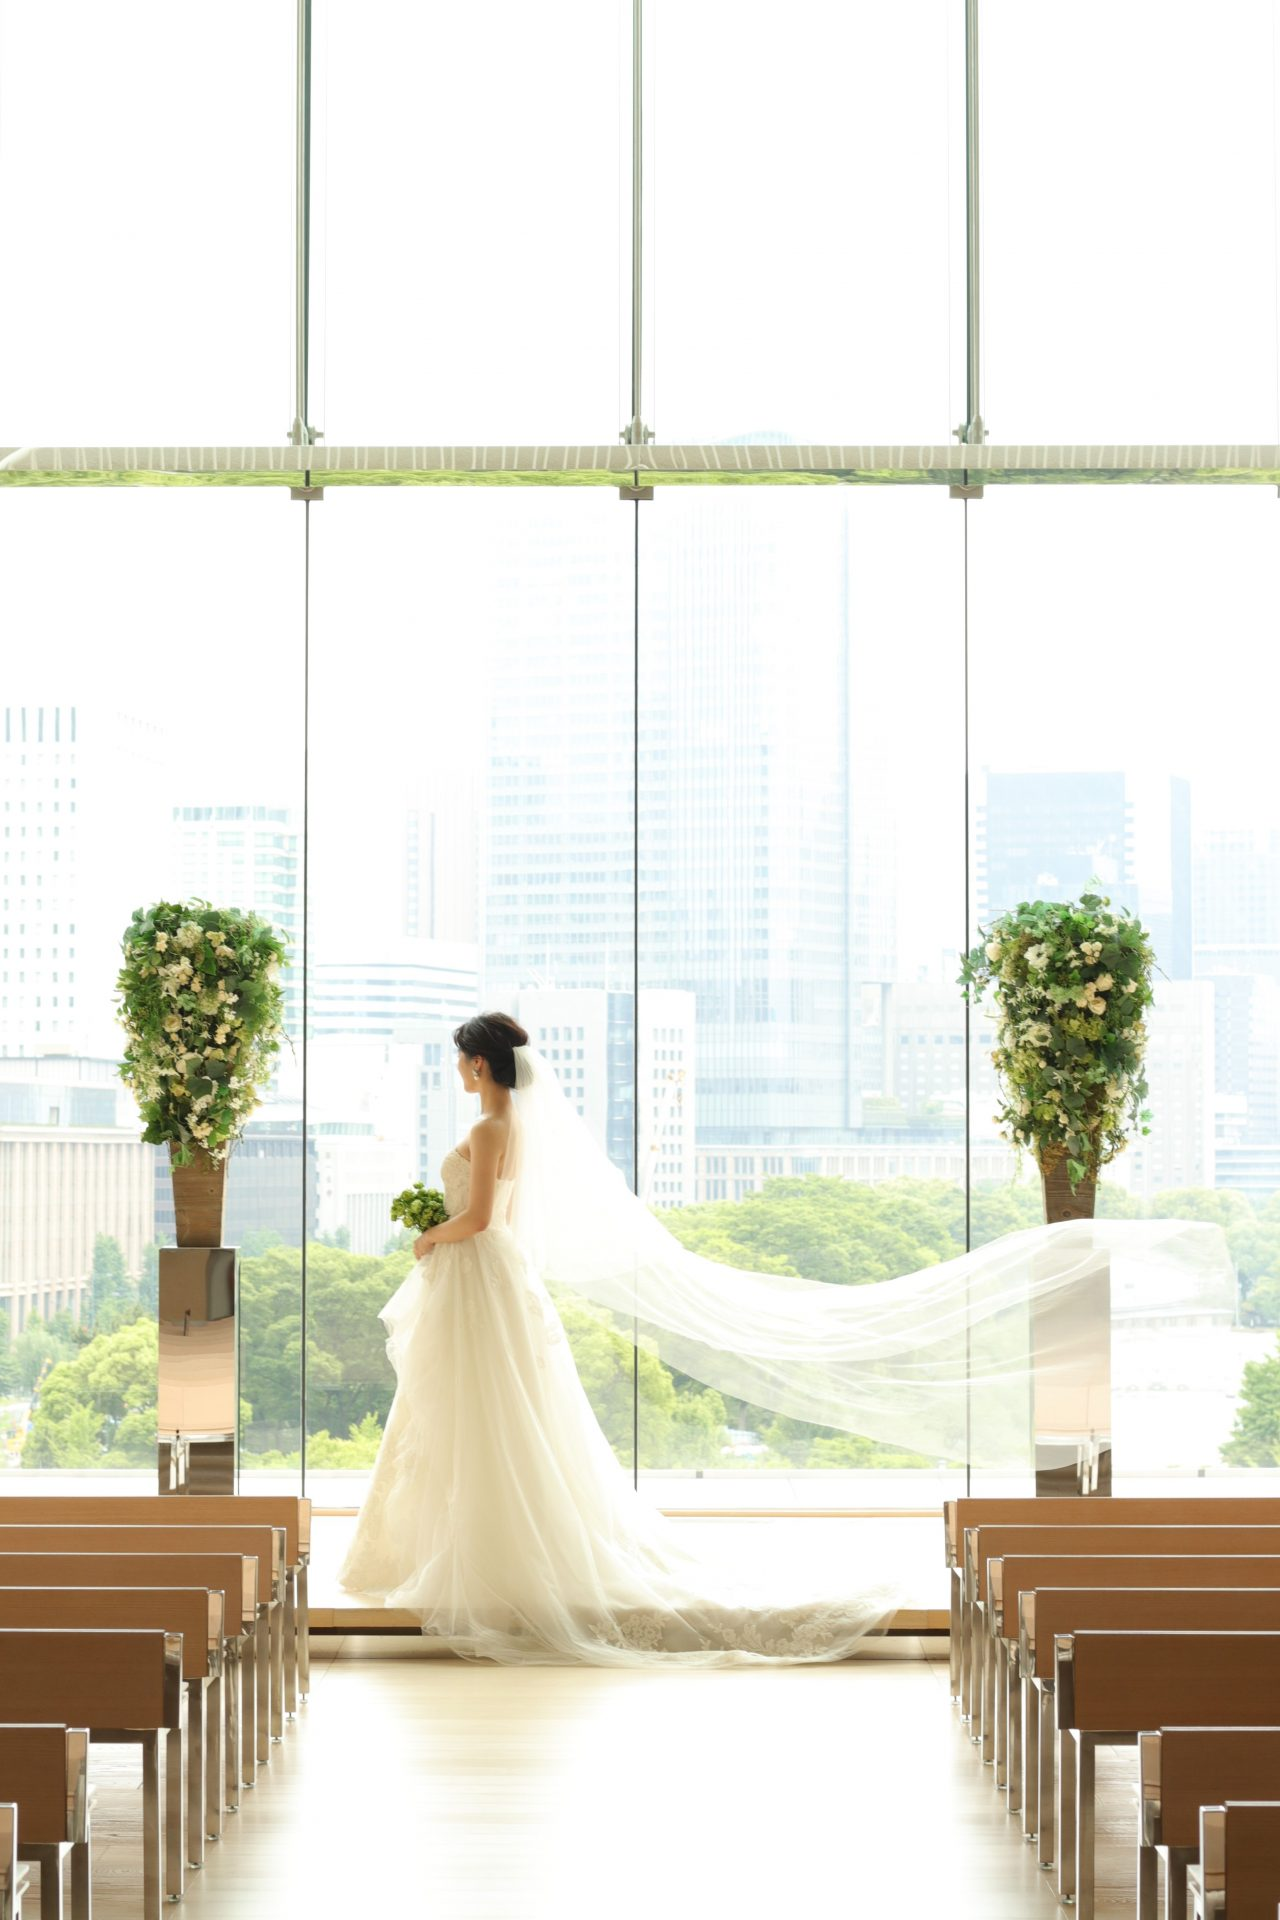 THETREATDRESSING ADDITION店の提携会場であるパレスホテル東京の広いチャペルや披露宴会場でも圧倒的な存在感を放つのは、自然な広がりが美しいAラインのチュールドレスです